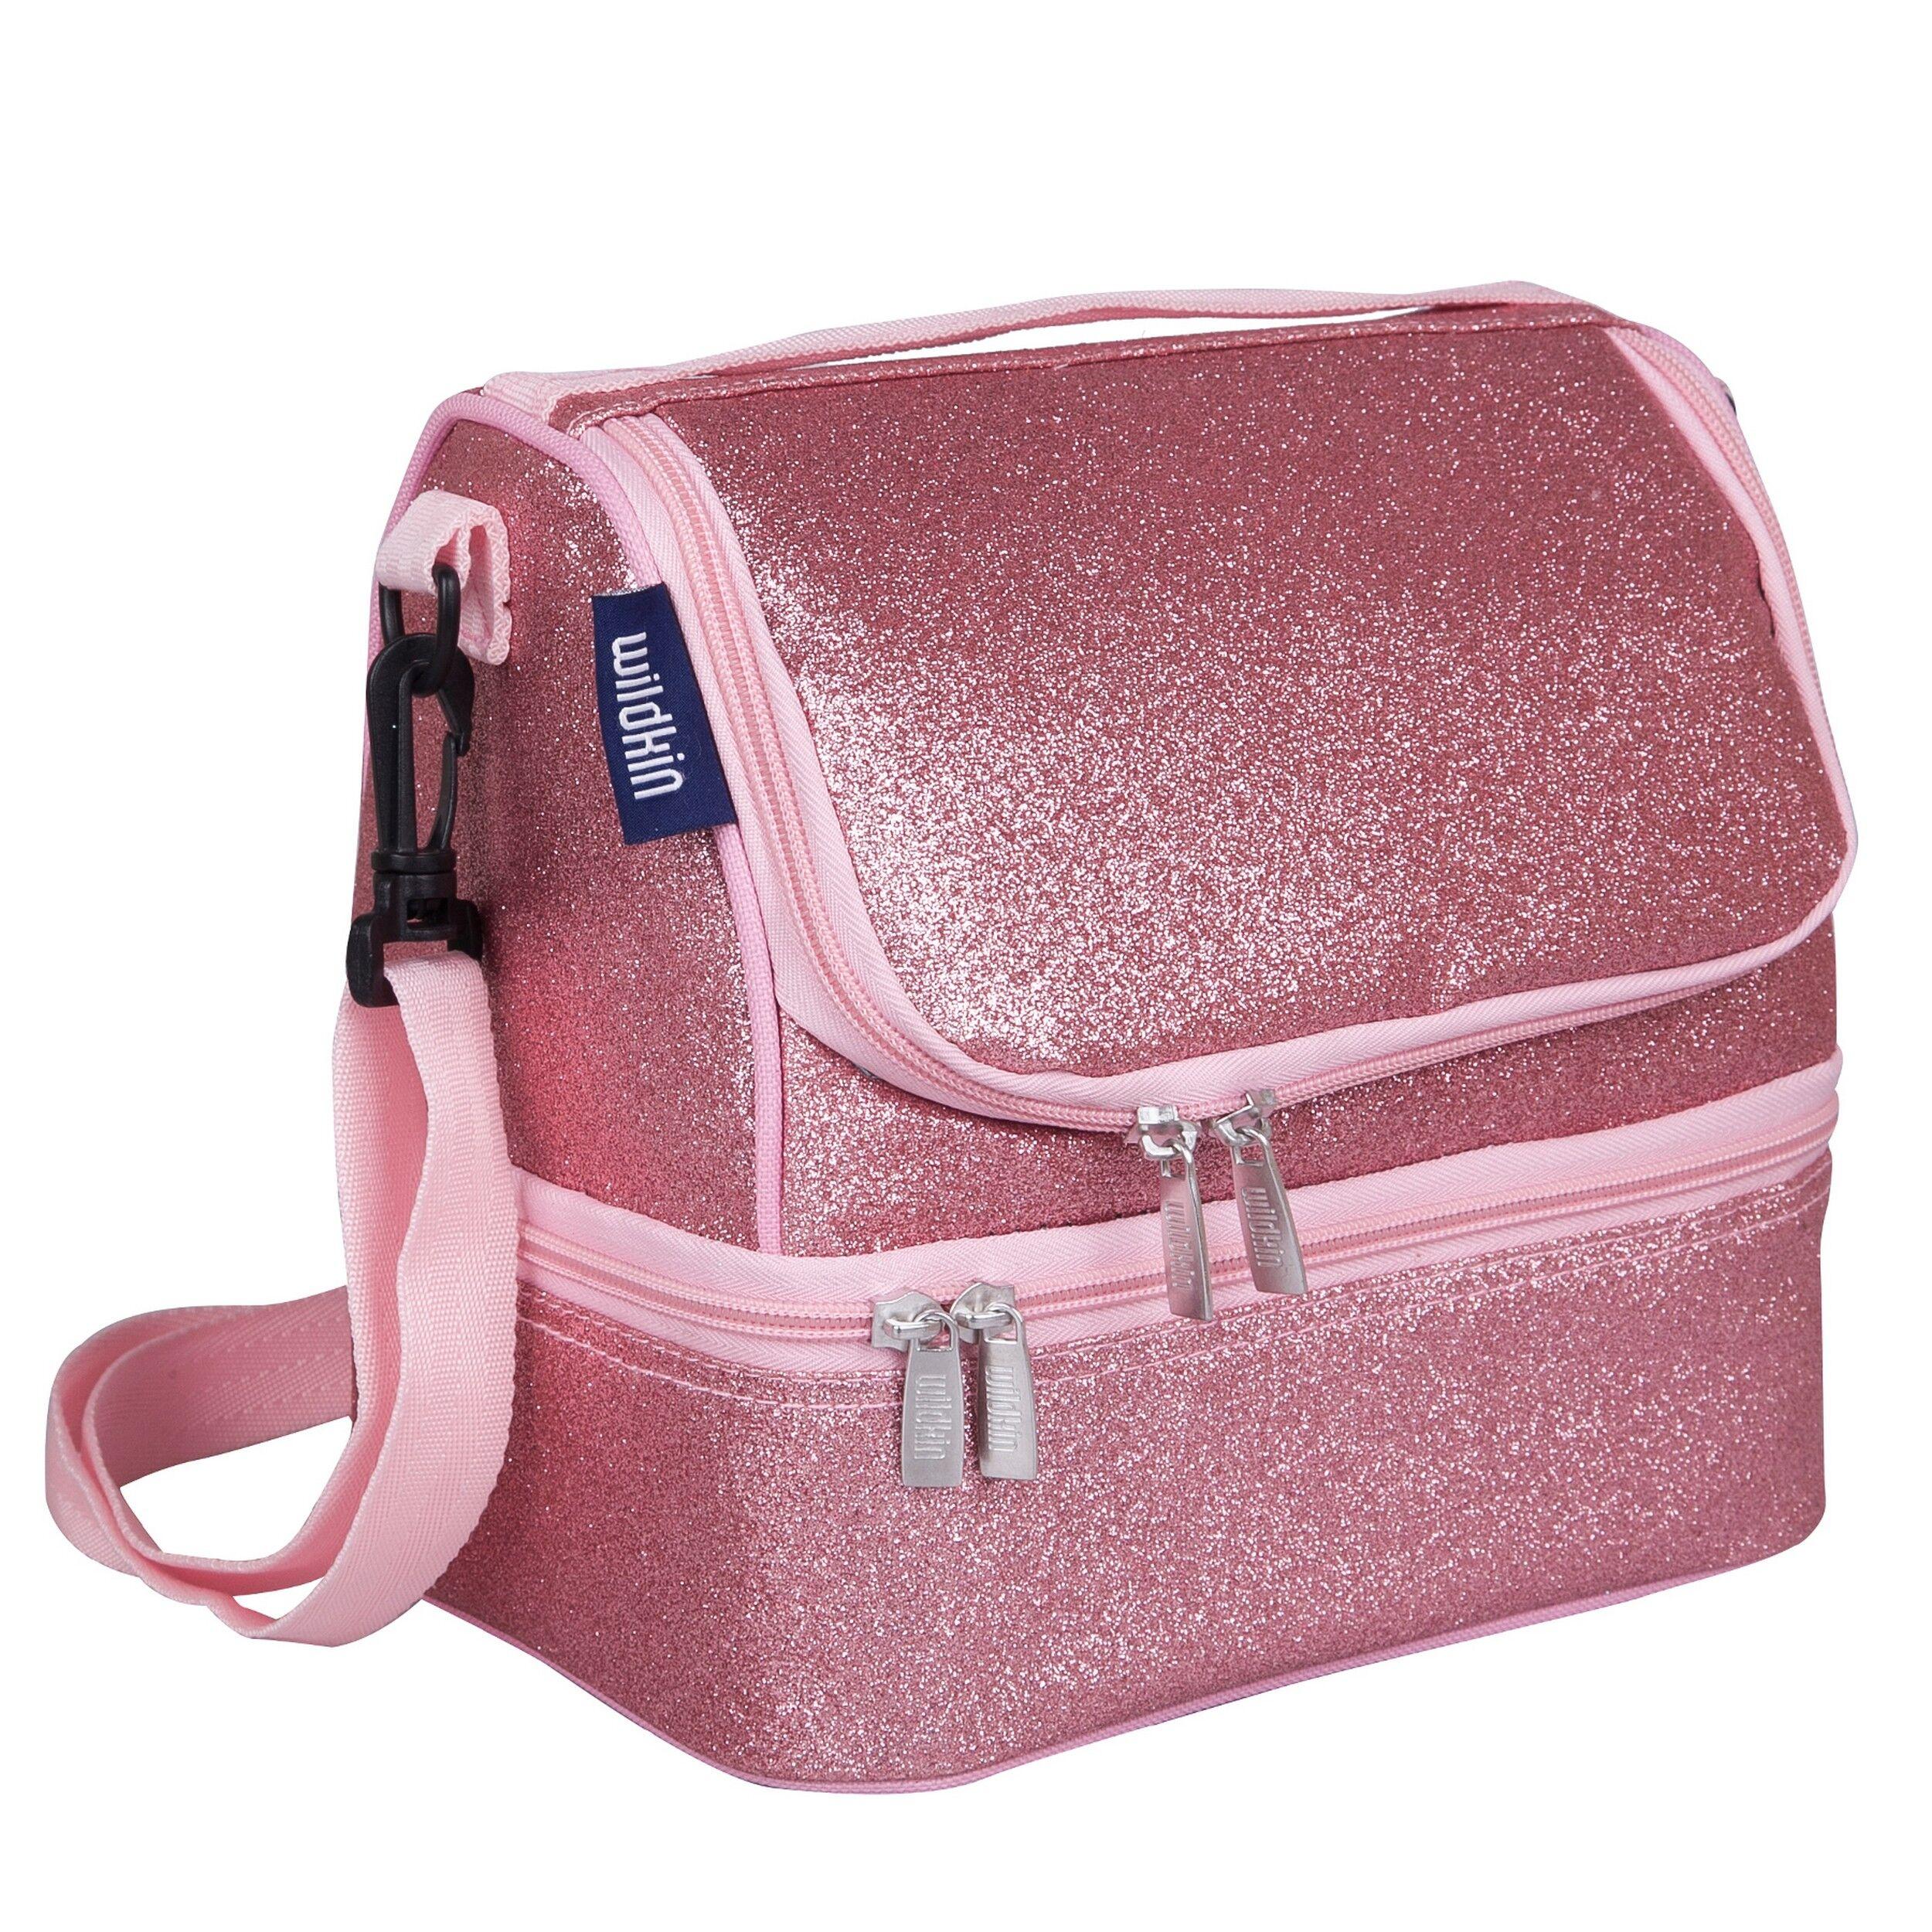 Double Decker Lunch Bags